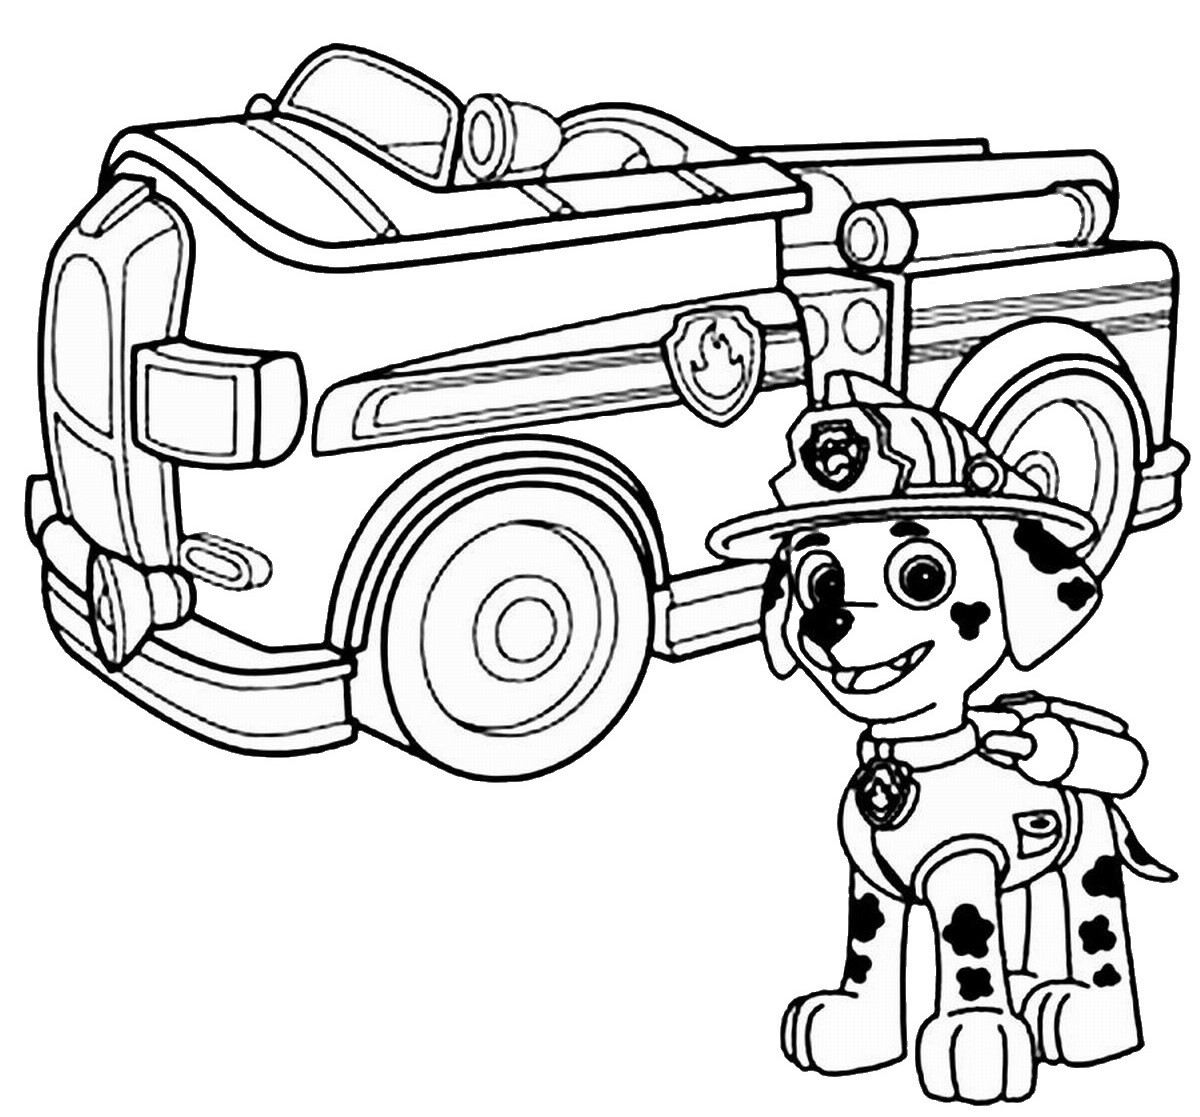 Paw Patrol Car Coloring Pages : Free nick jr paw patrol coloring pages